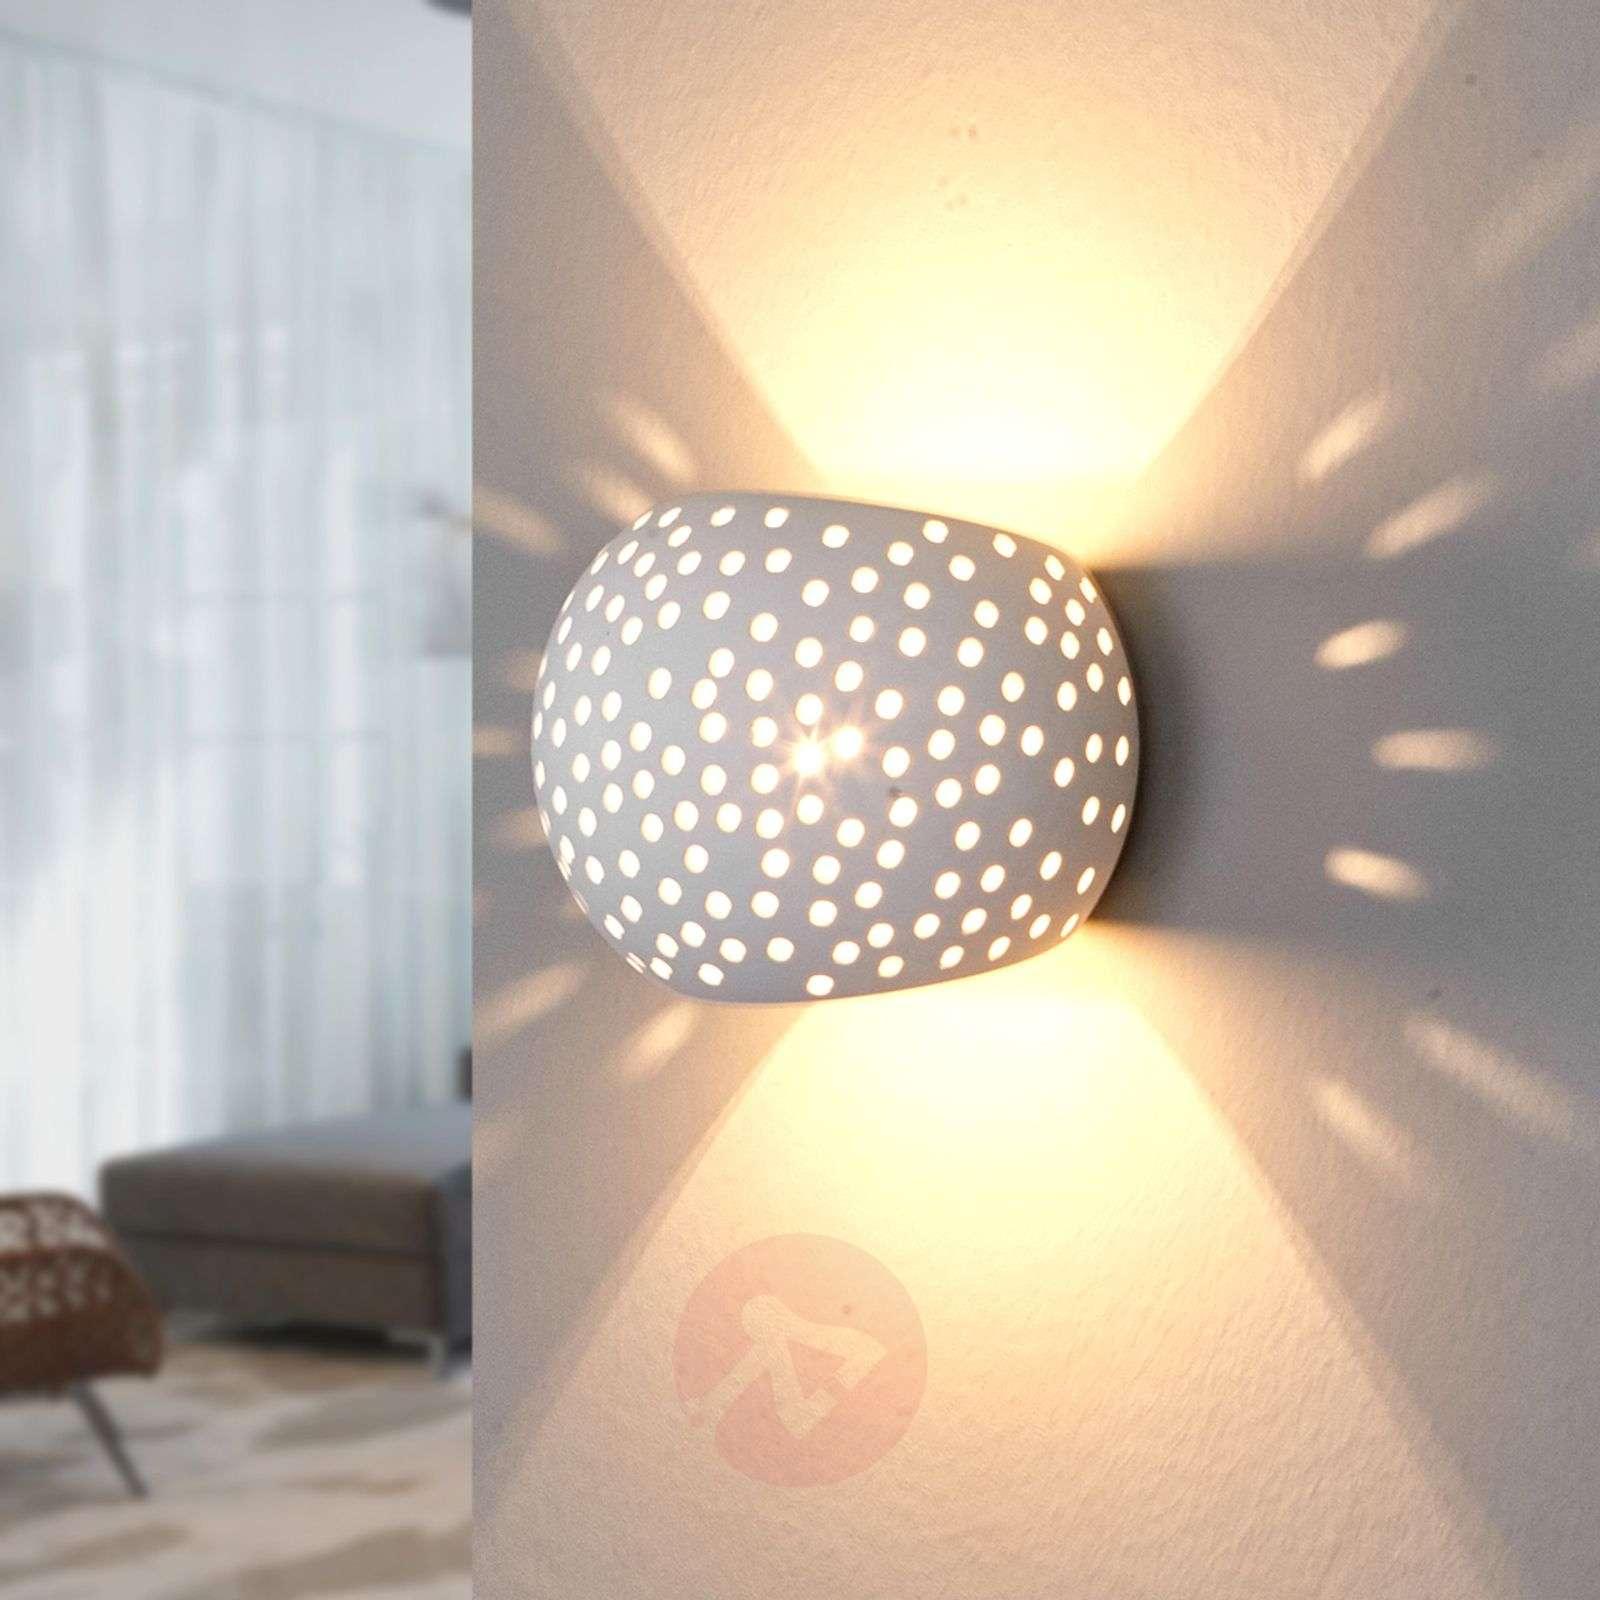 Spherical plaster wall lamp Jiru with hole pattern-9613050-02